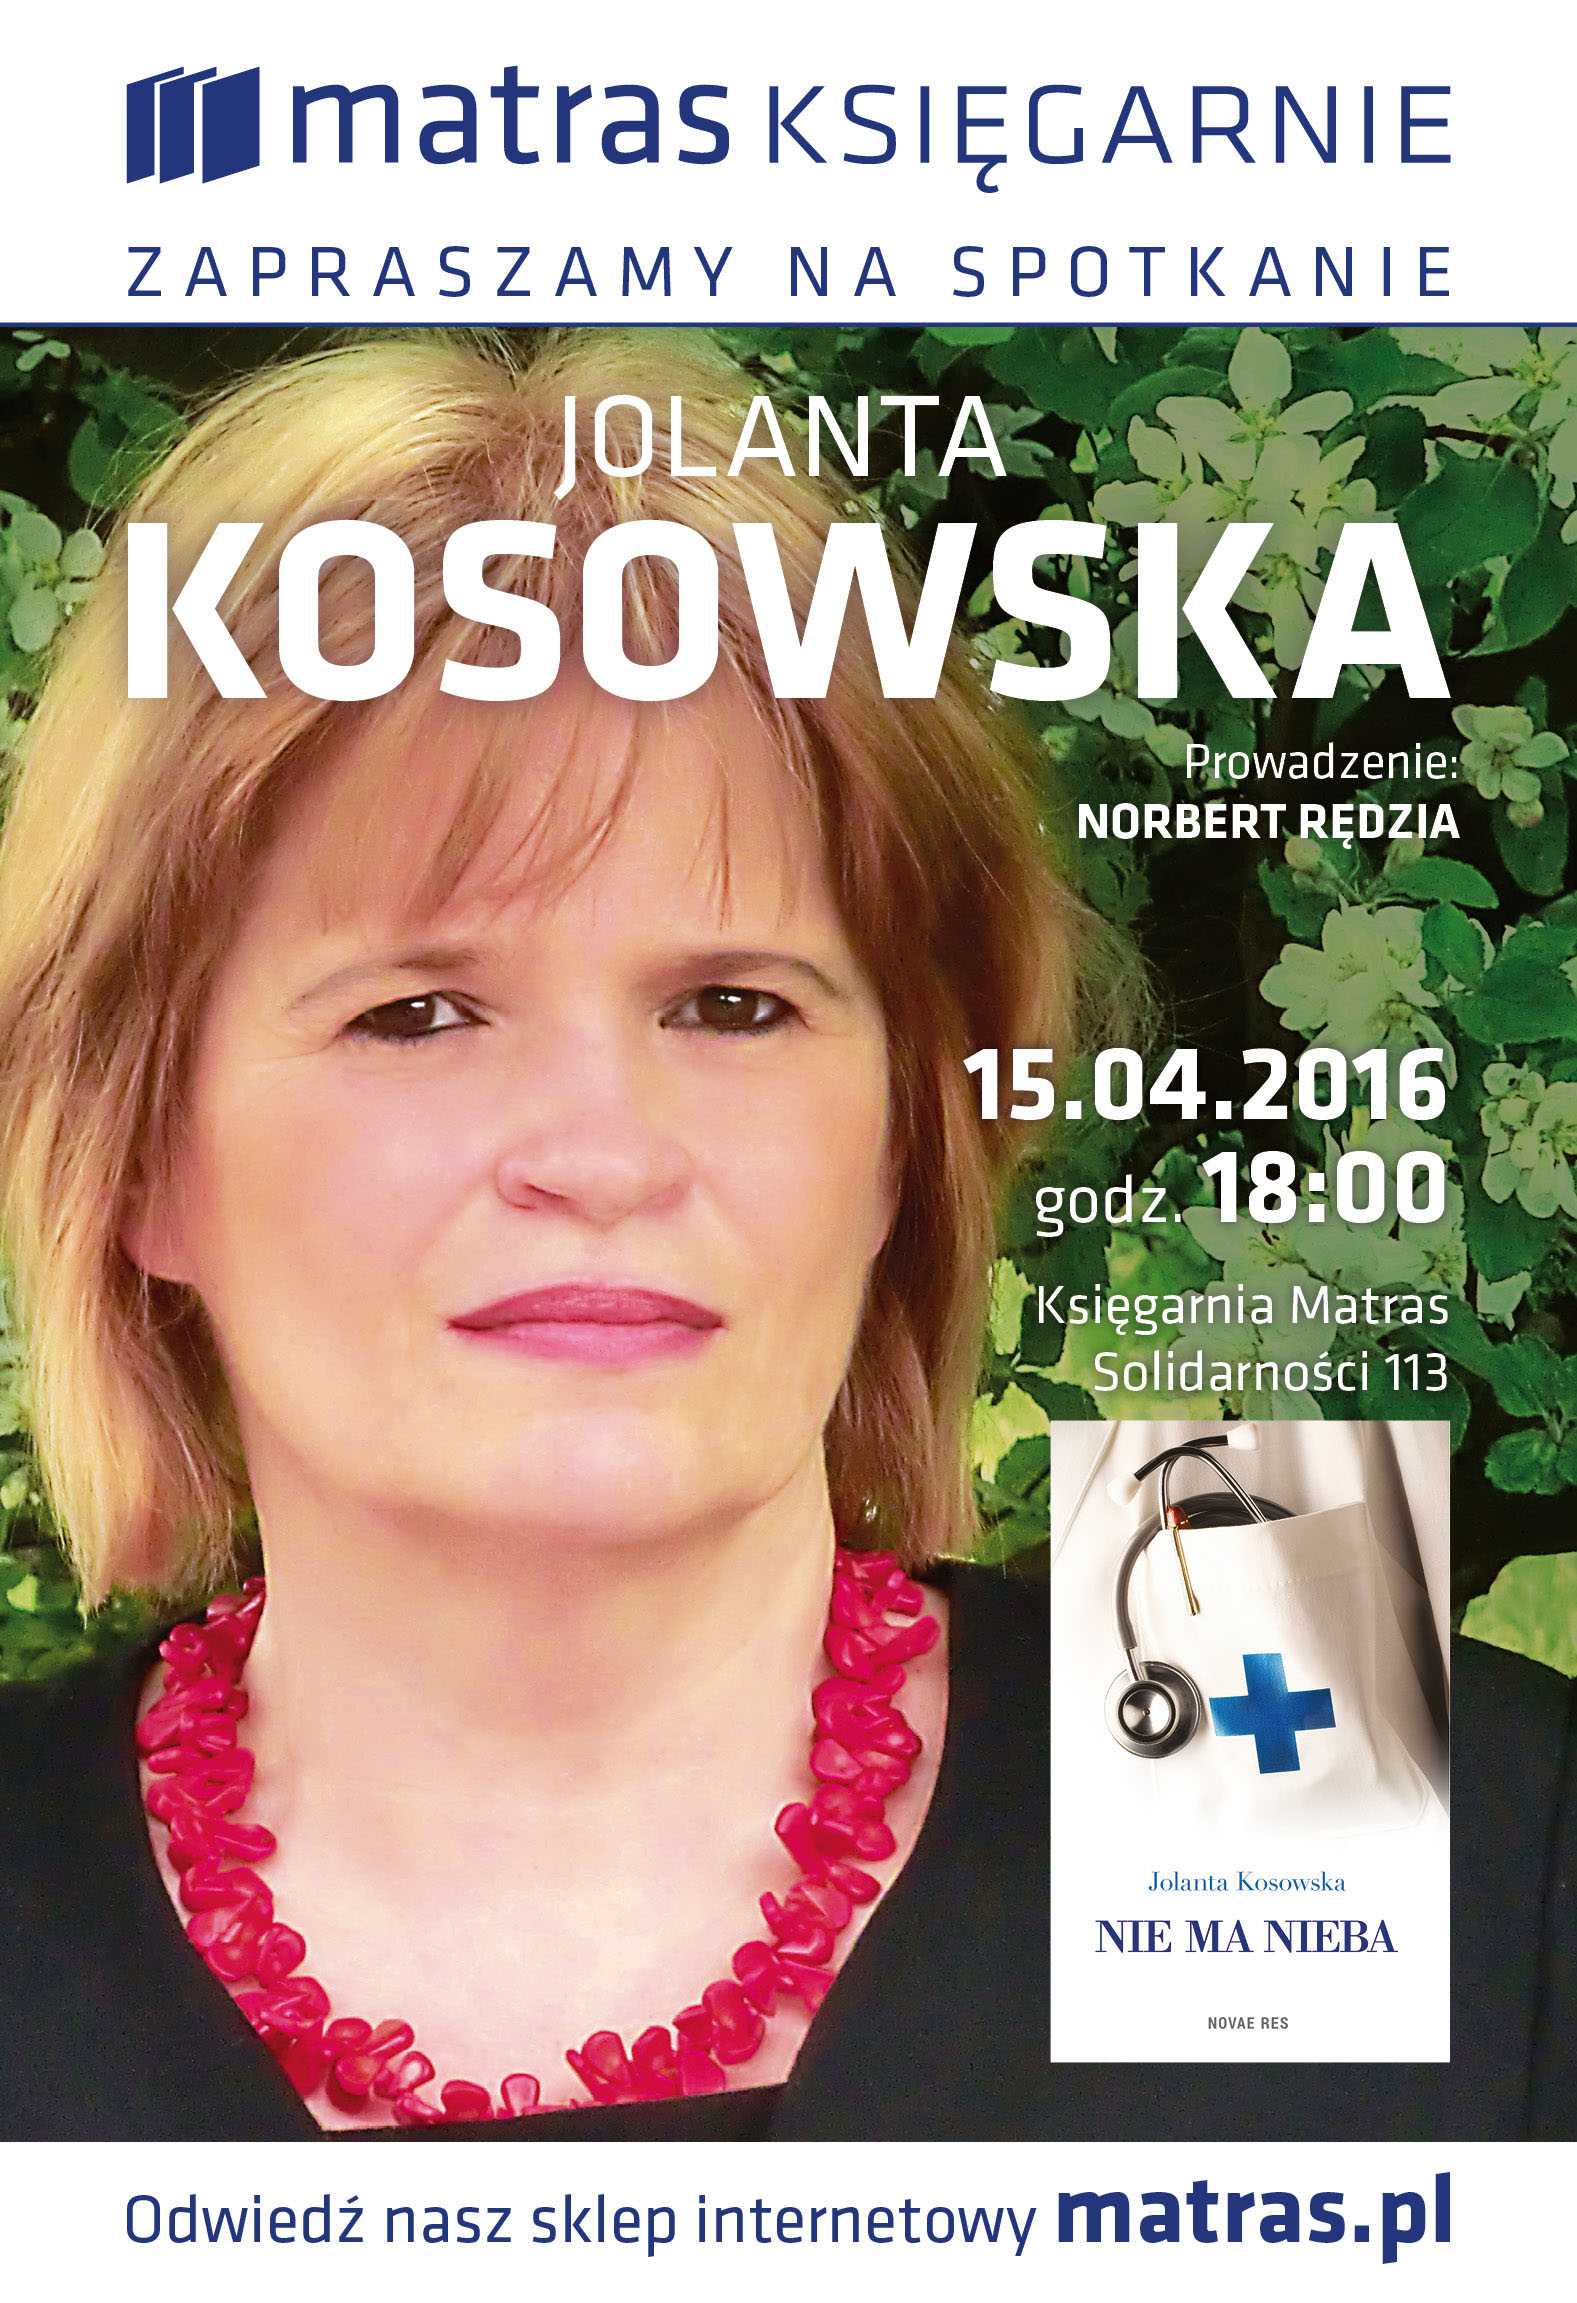 matras_spotkanie_jolanta kosowska_2016_WARS_plakat_A3_v1